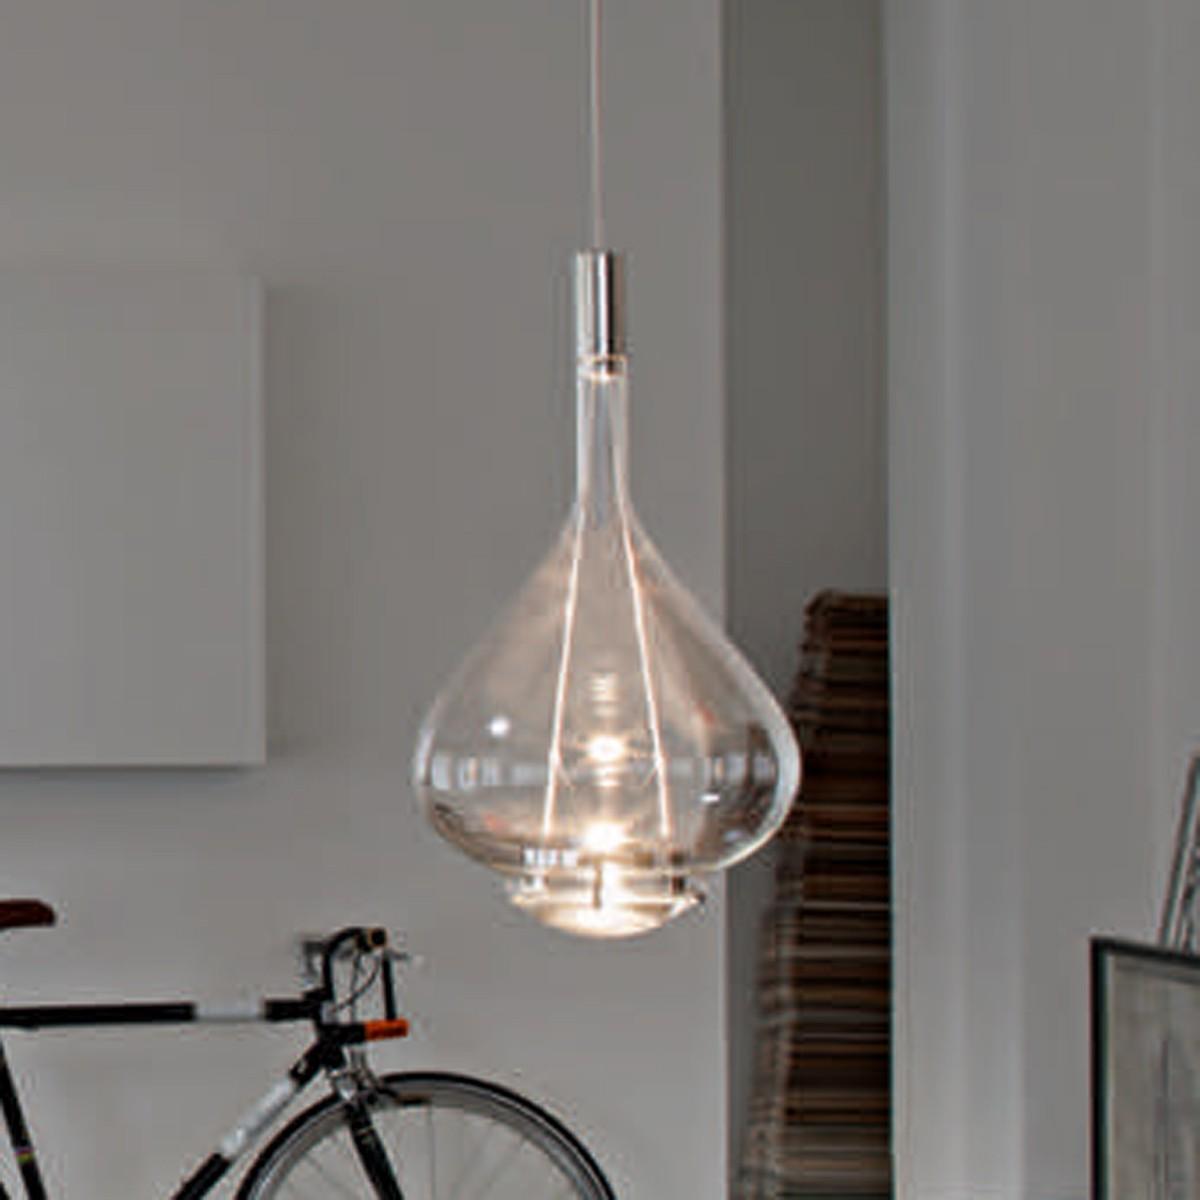 Studio Italia Design Sky-Fall Medium Pendelleuchte, Chrom / Kristallglas